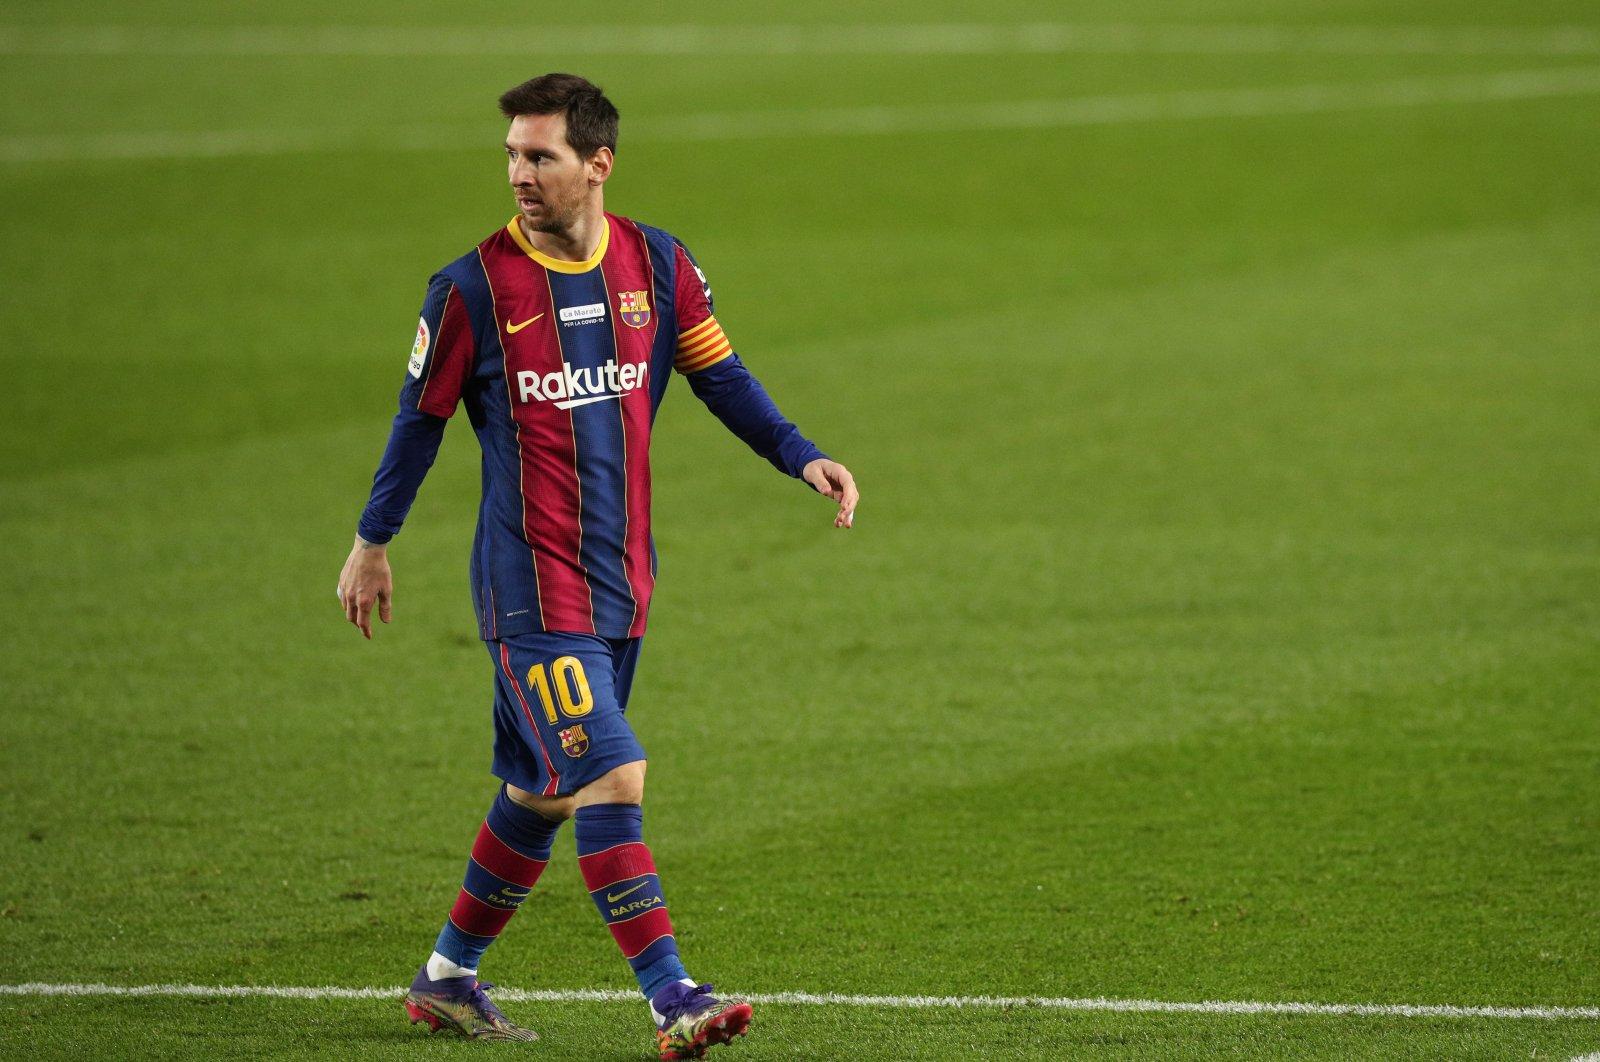 Barcelona's Lionel Messi during FC Barcelona v Valencia game at Camp Nou, Barcelona, Spain on Dec. 19, 2020. (Reuters Photo)